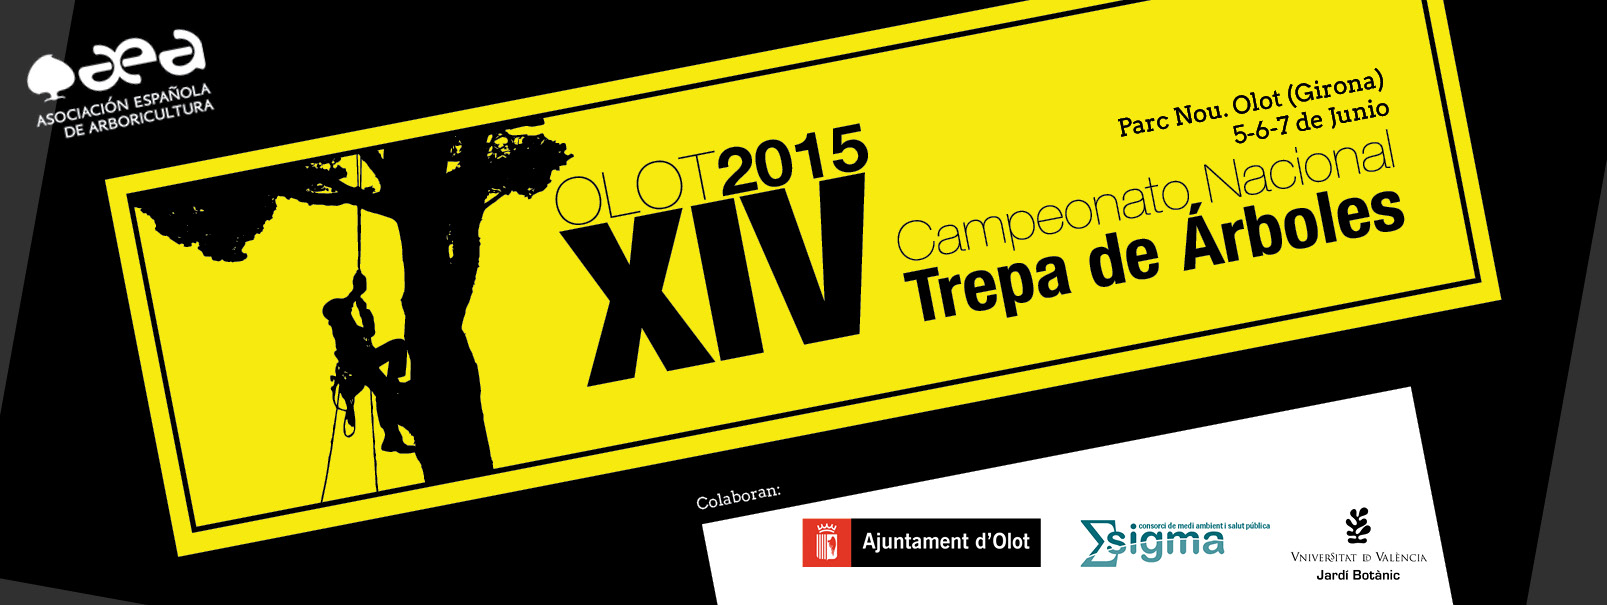 banner web campeonato